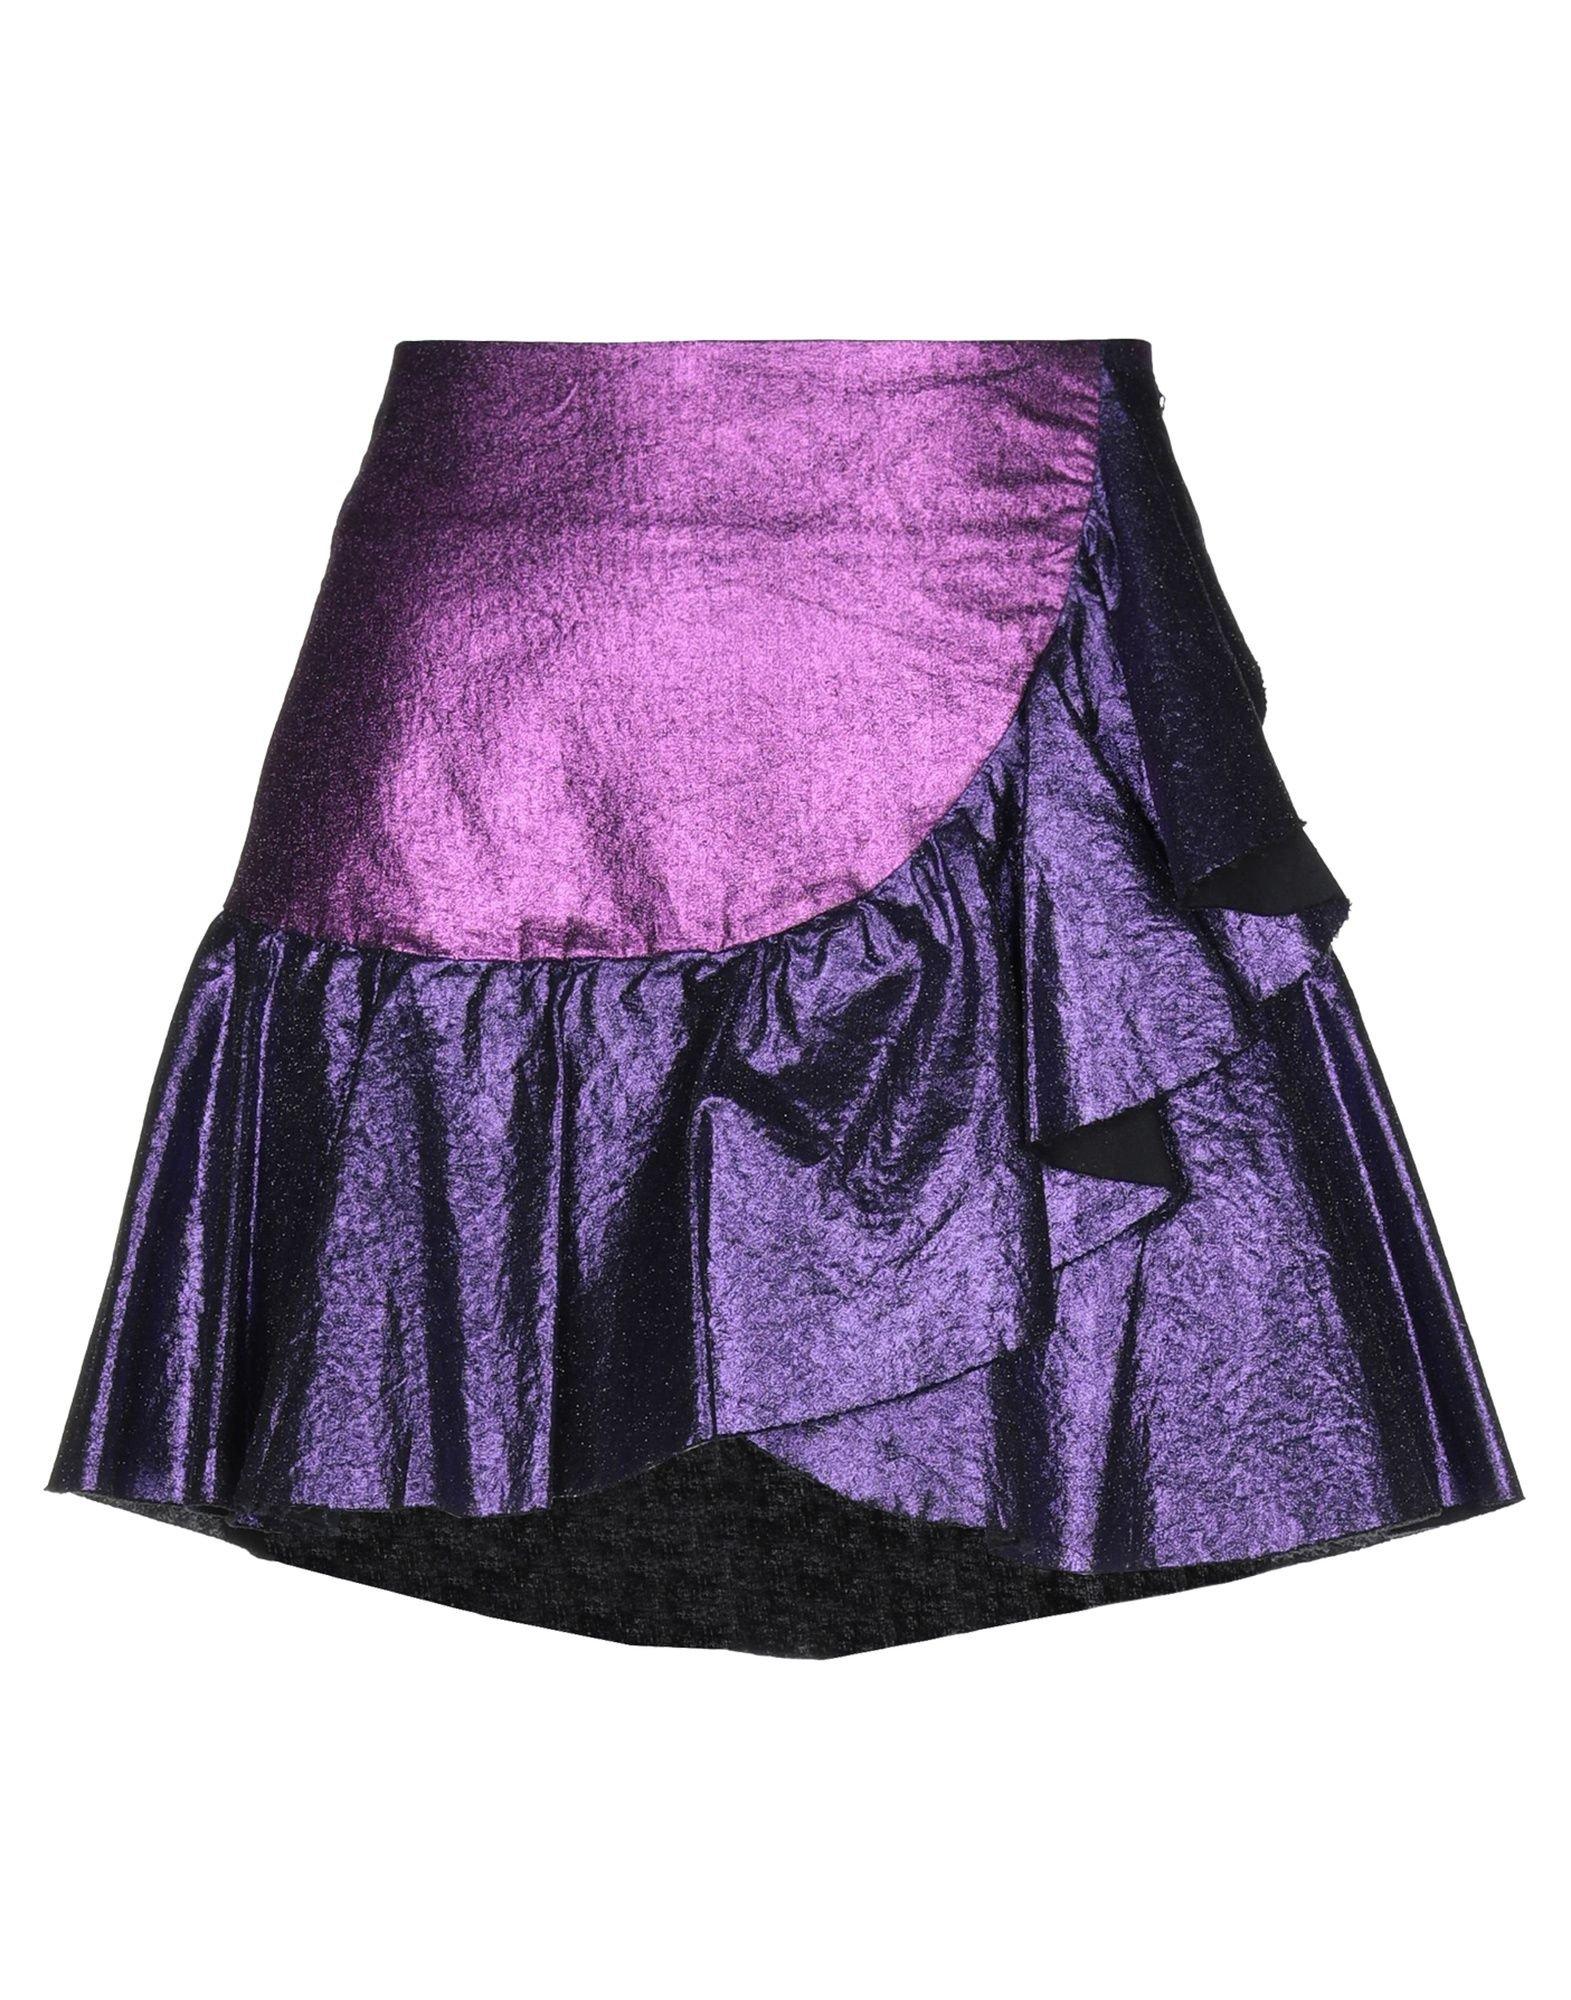 8Pm Mini Skirt - Women 8Pm Mini Skirts online on YOOX United States - 35403749LF